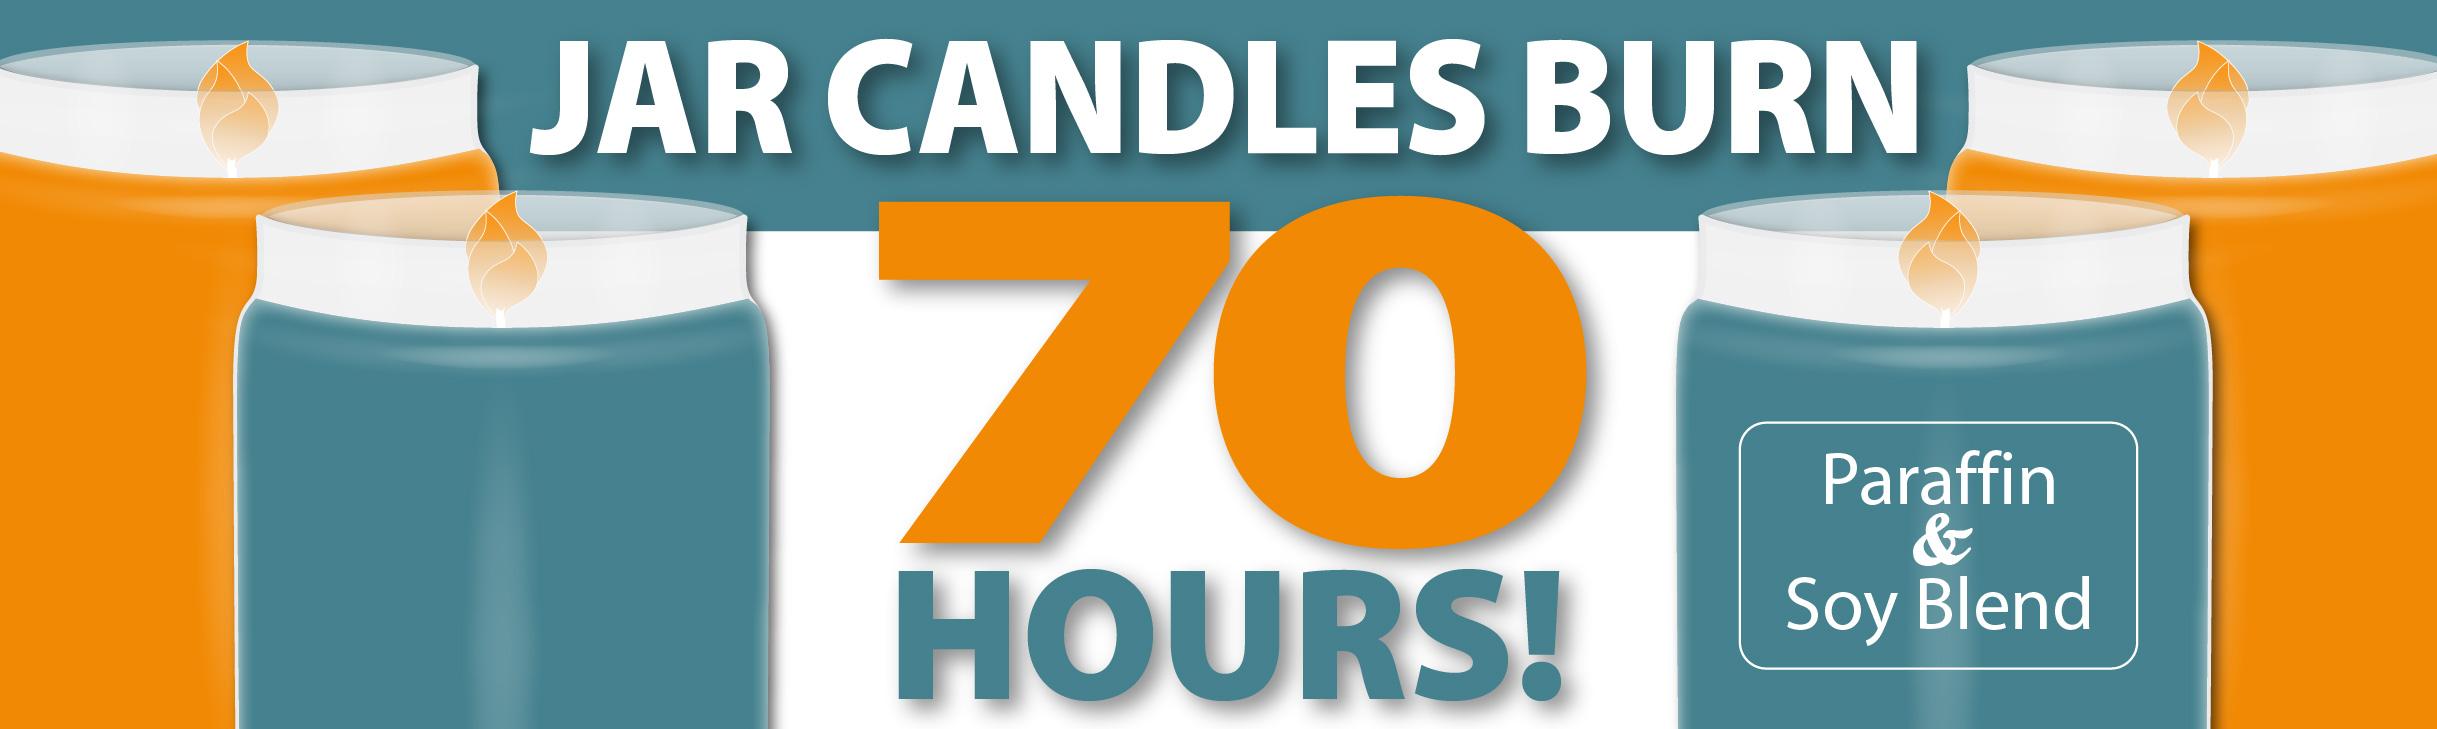 Jar Candles Burn 70 Hours